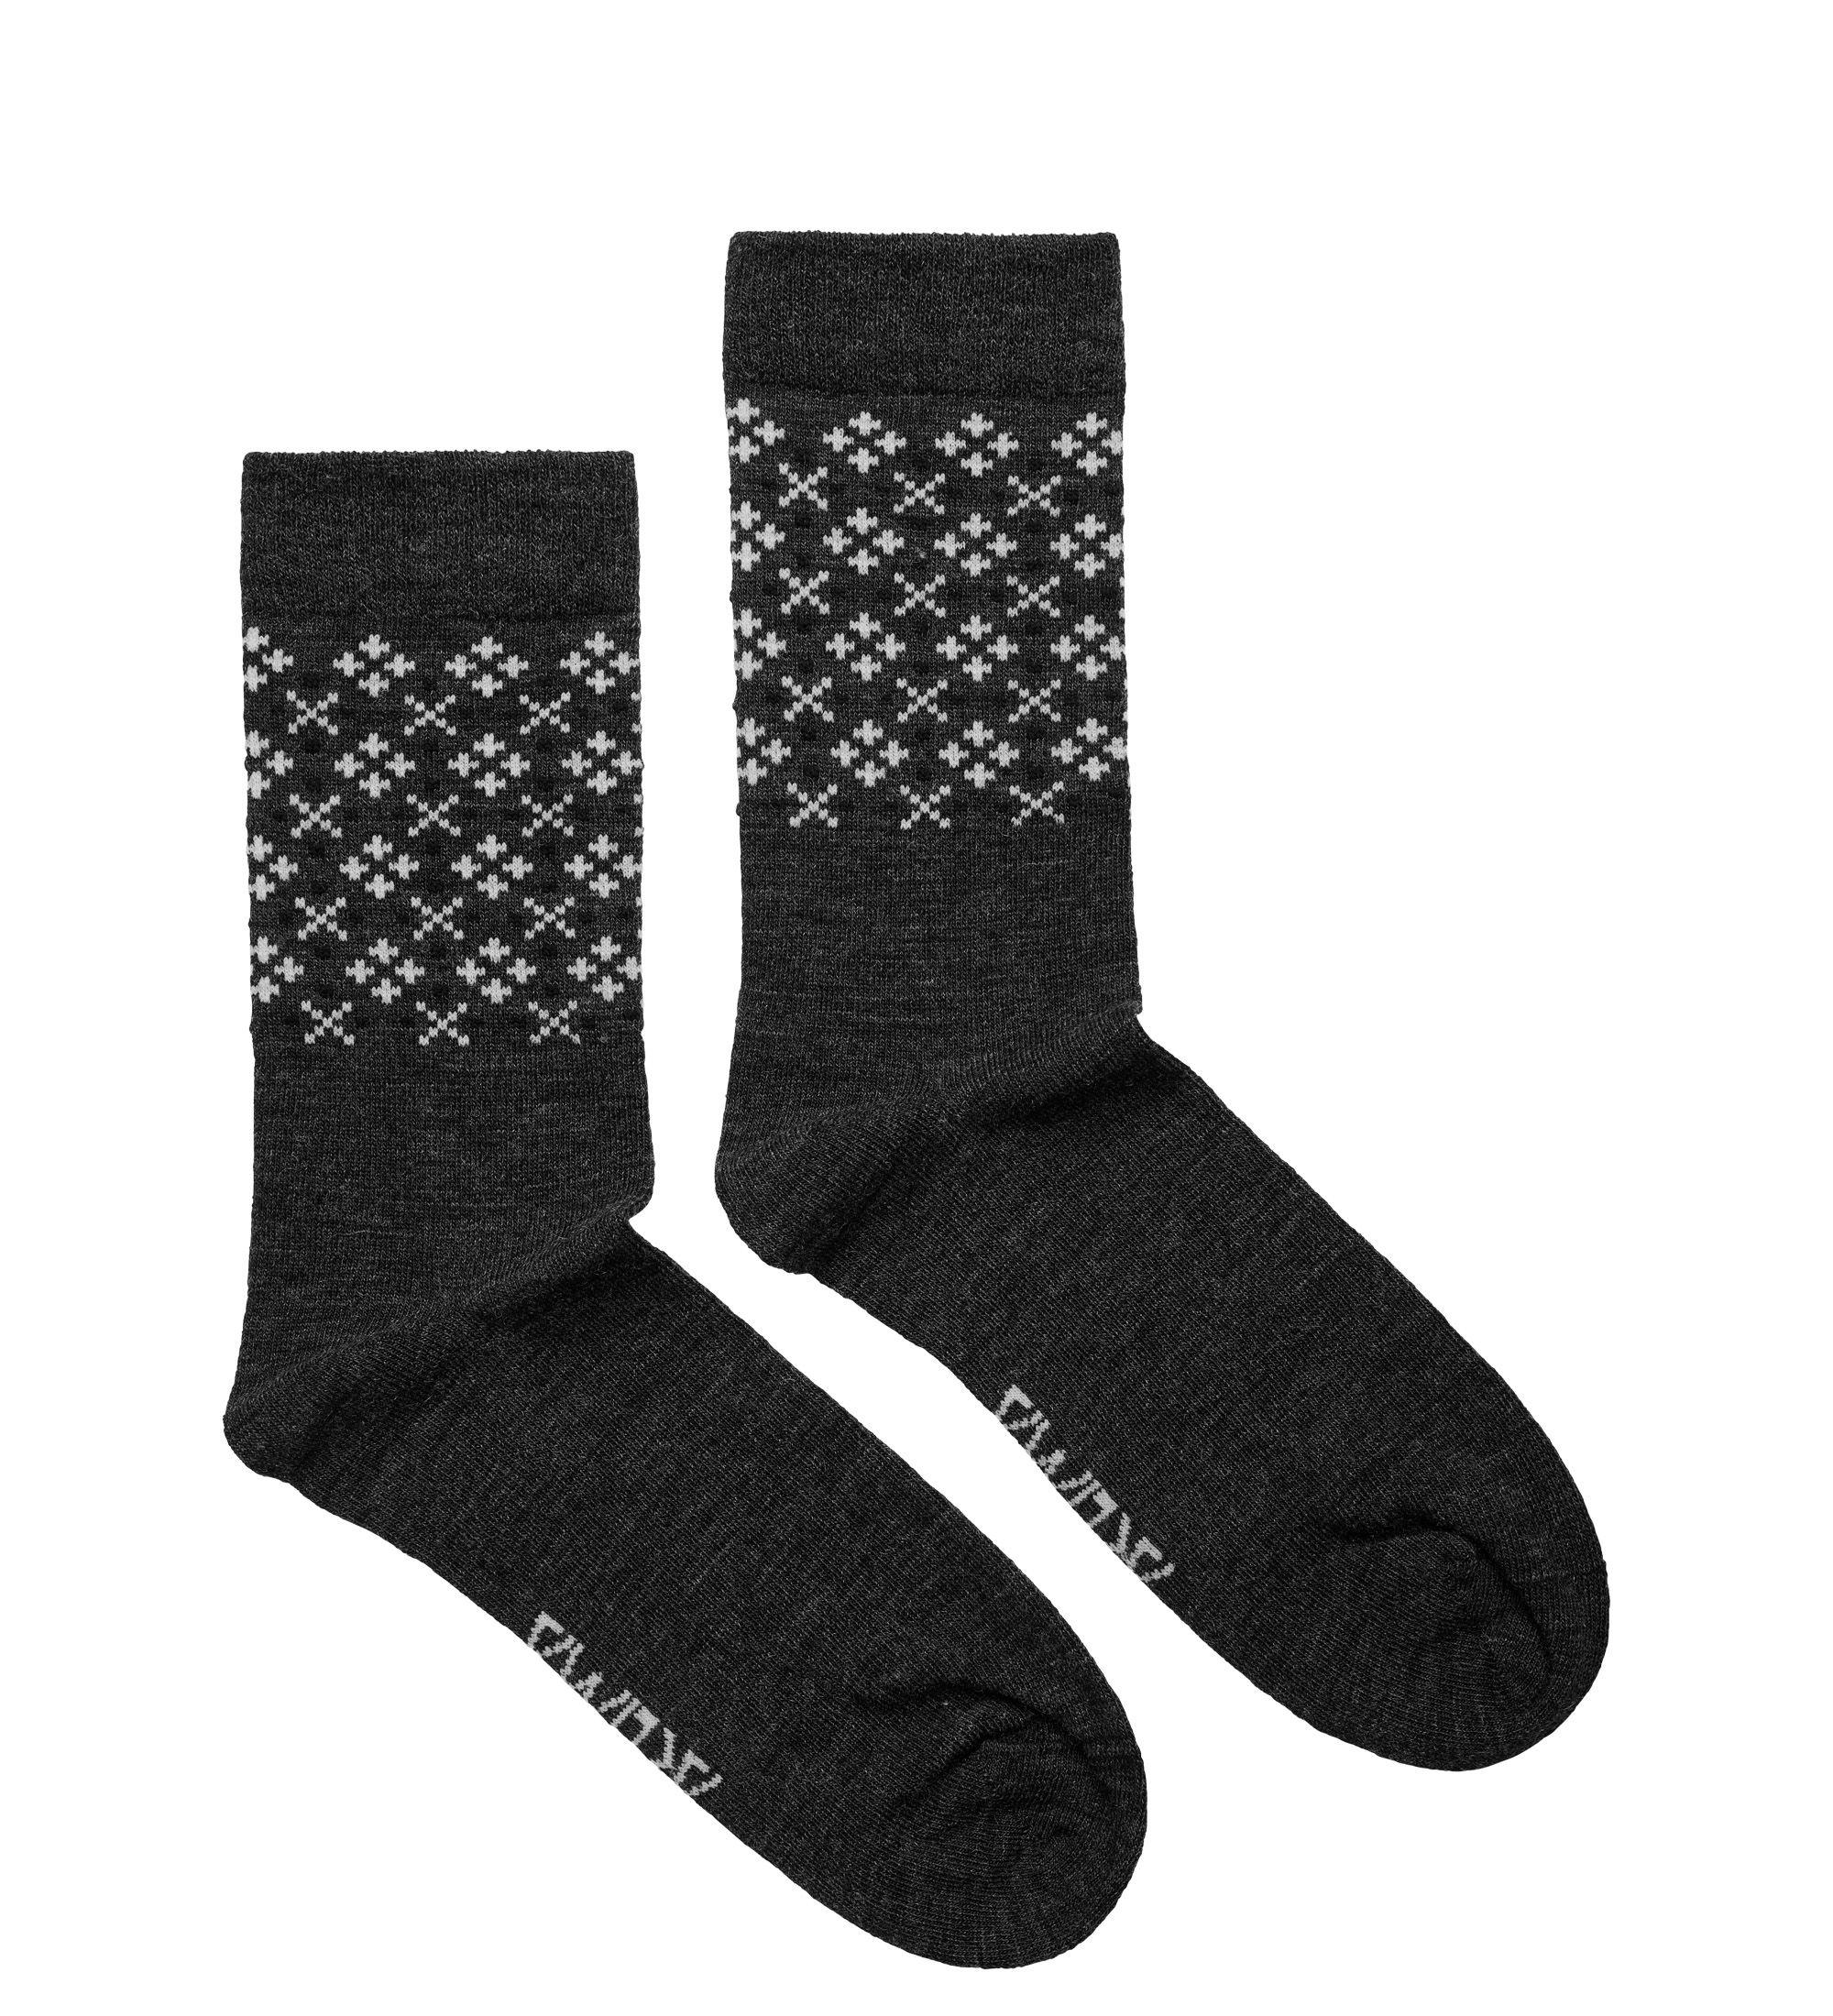 Aclima DesignWool Socks, 1 par